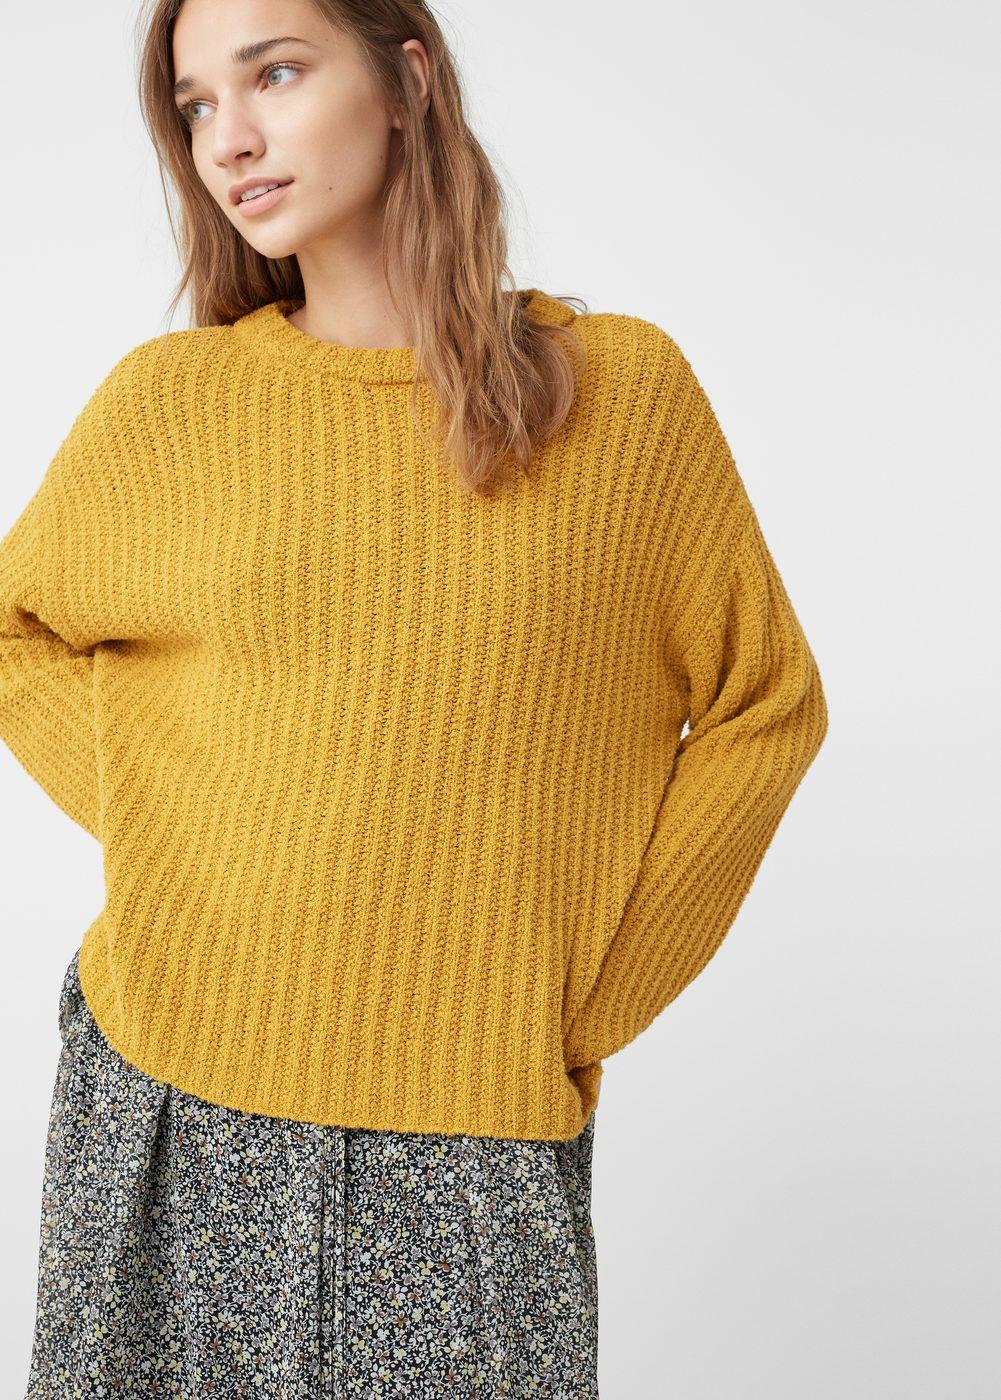 Jersey textura algodón - Cárdigans y jerséis de Mujer  557056d59145